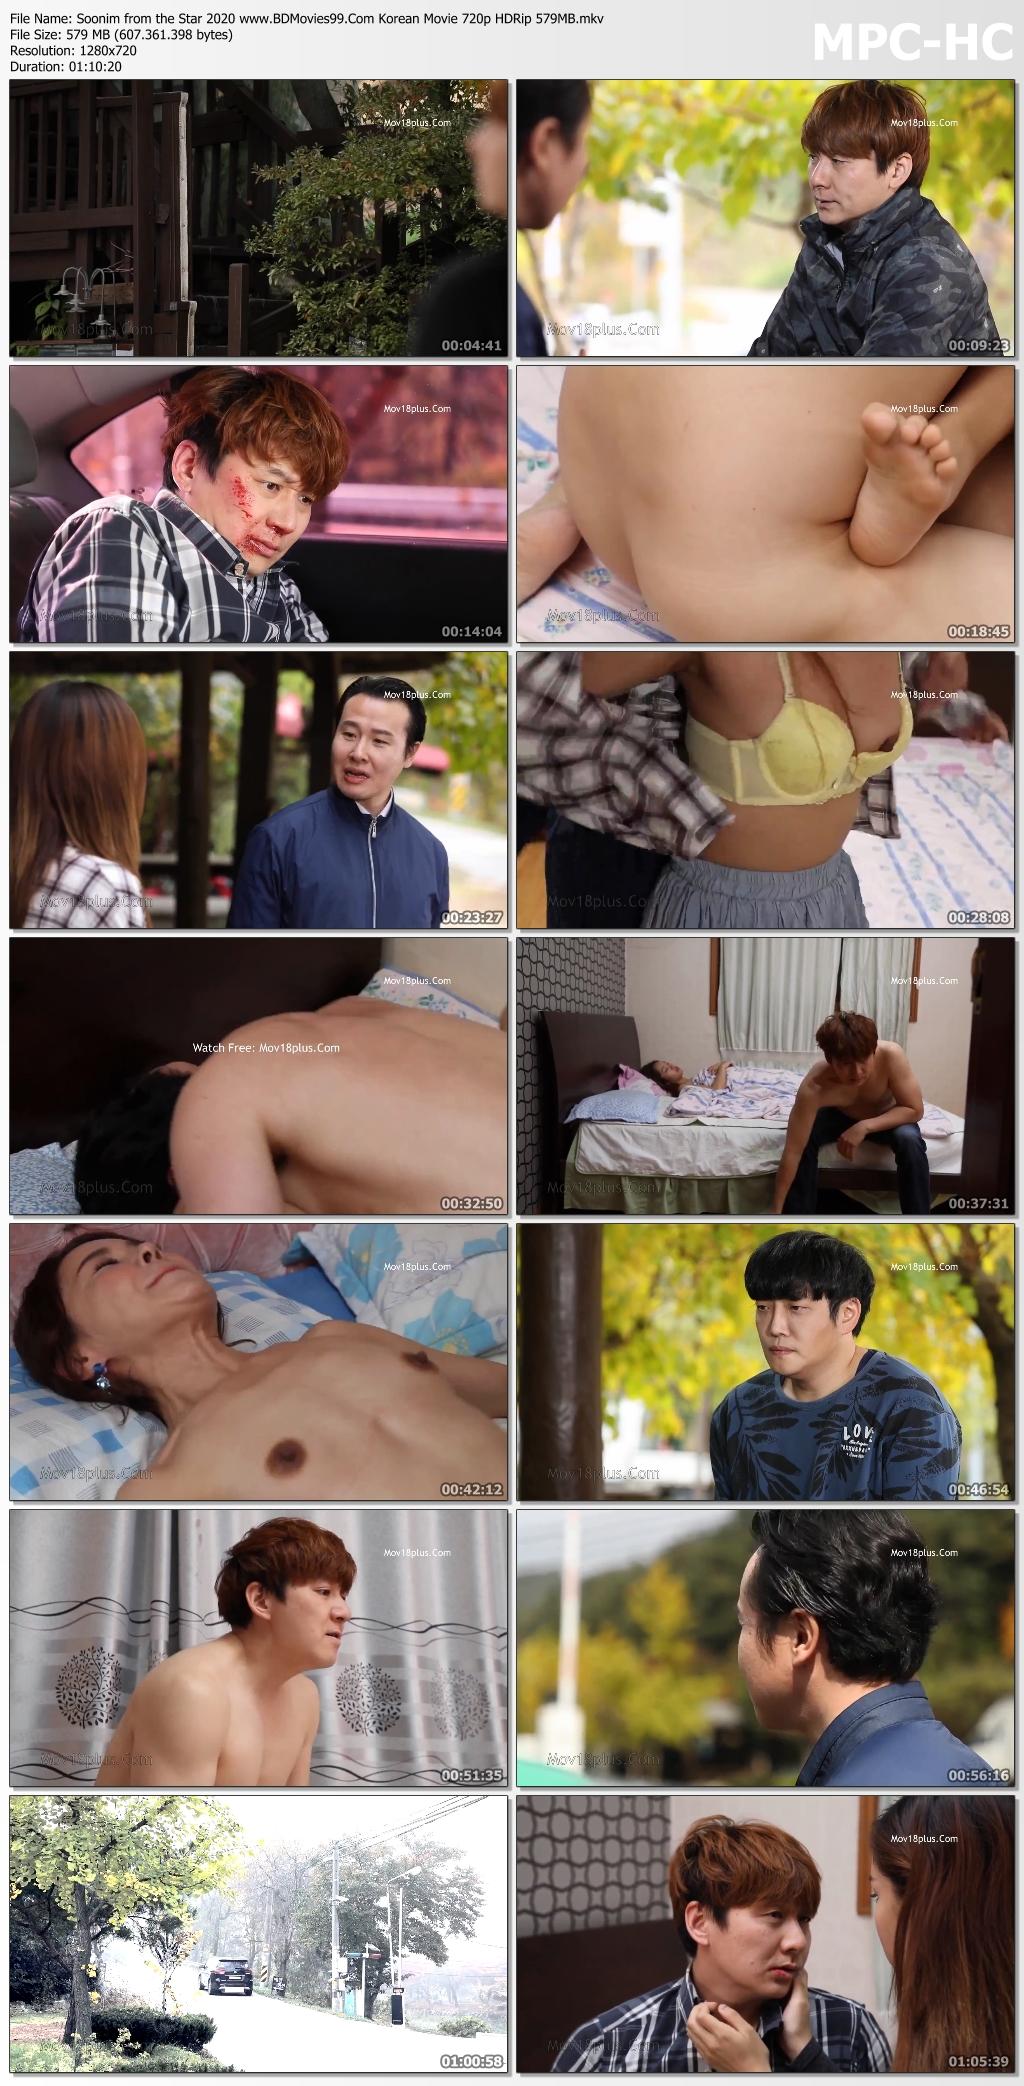 Soonim-from-the-Star-2020-www-BDMovies99-Com-Korean-Movie-720p-HDRip-579-MB-mkv-thumbs